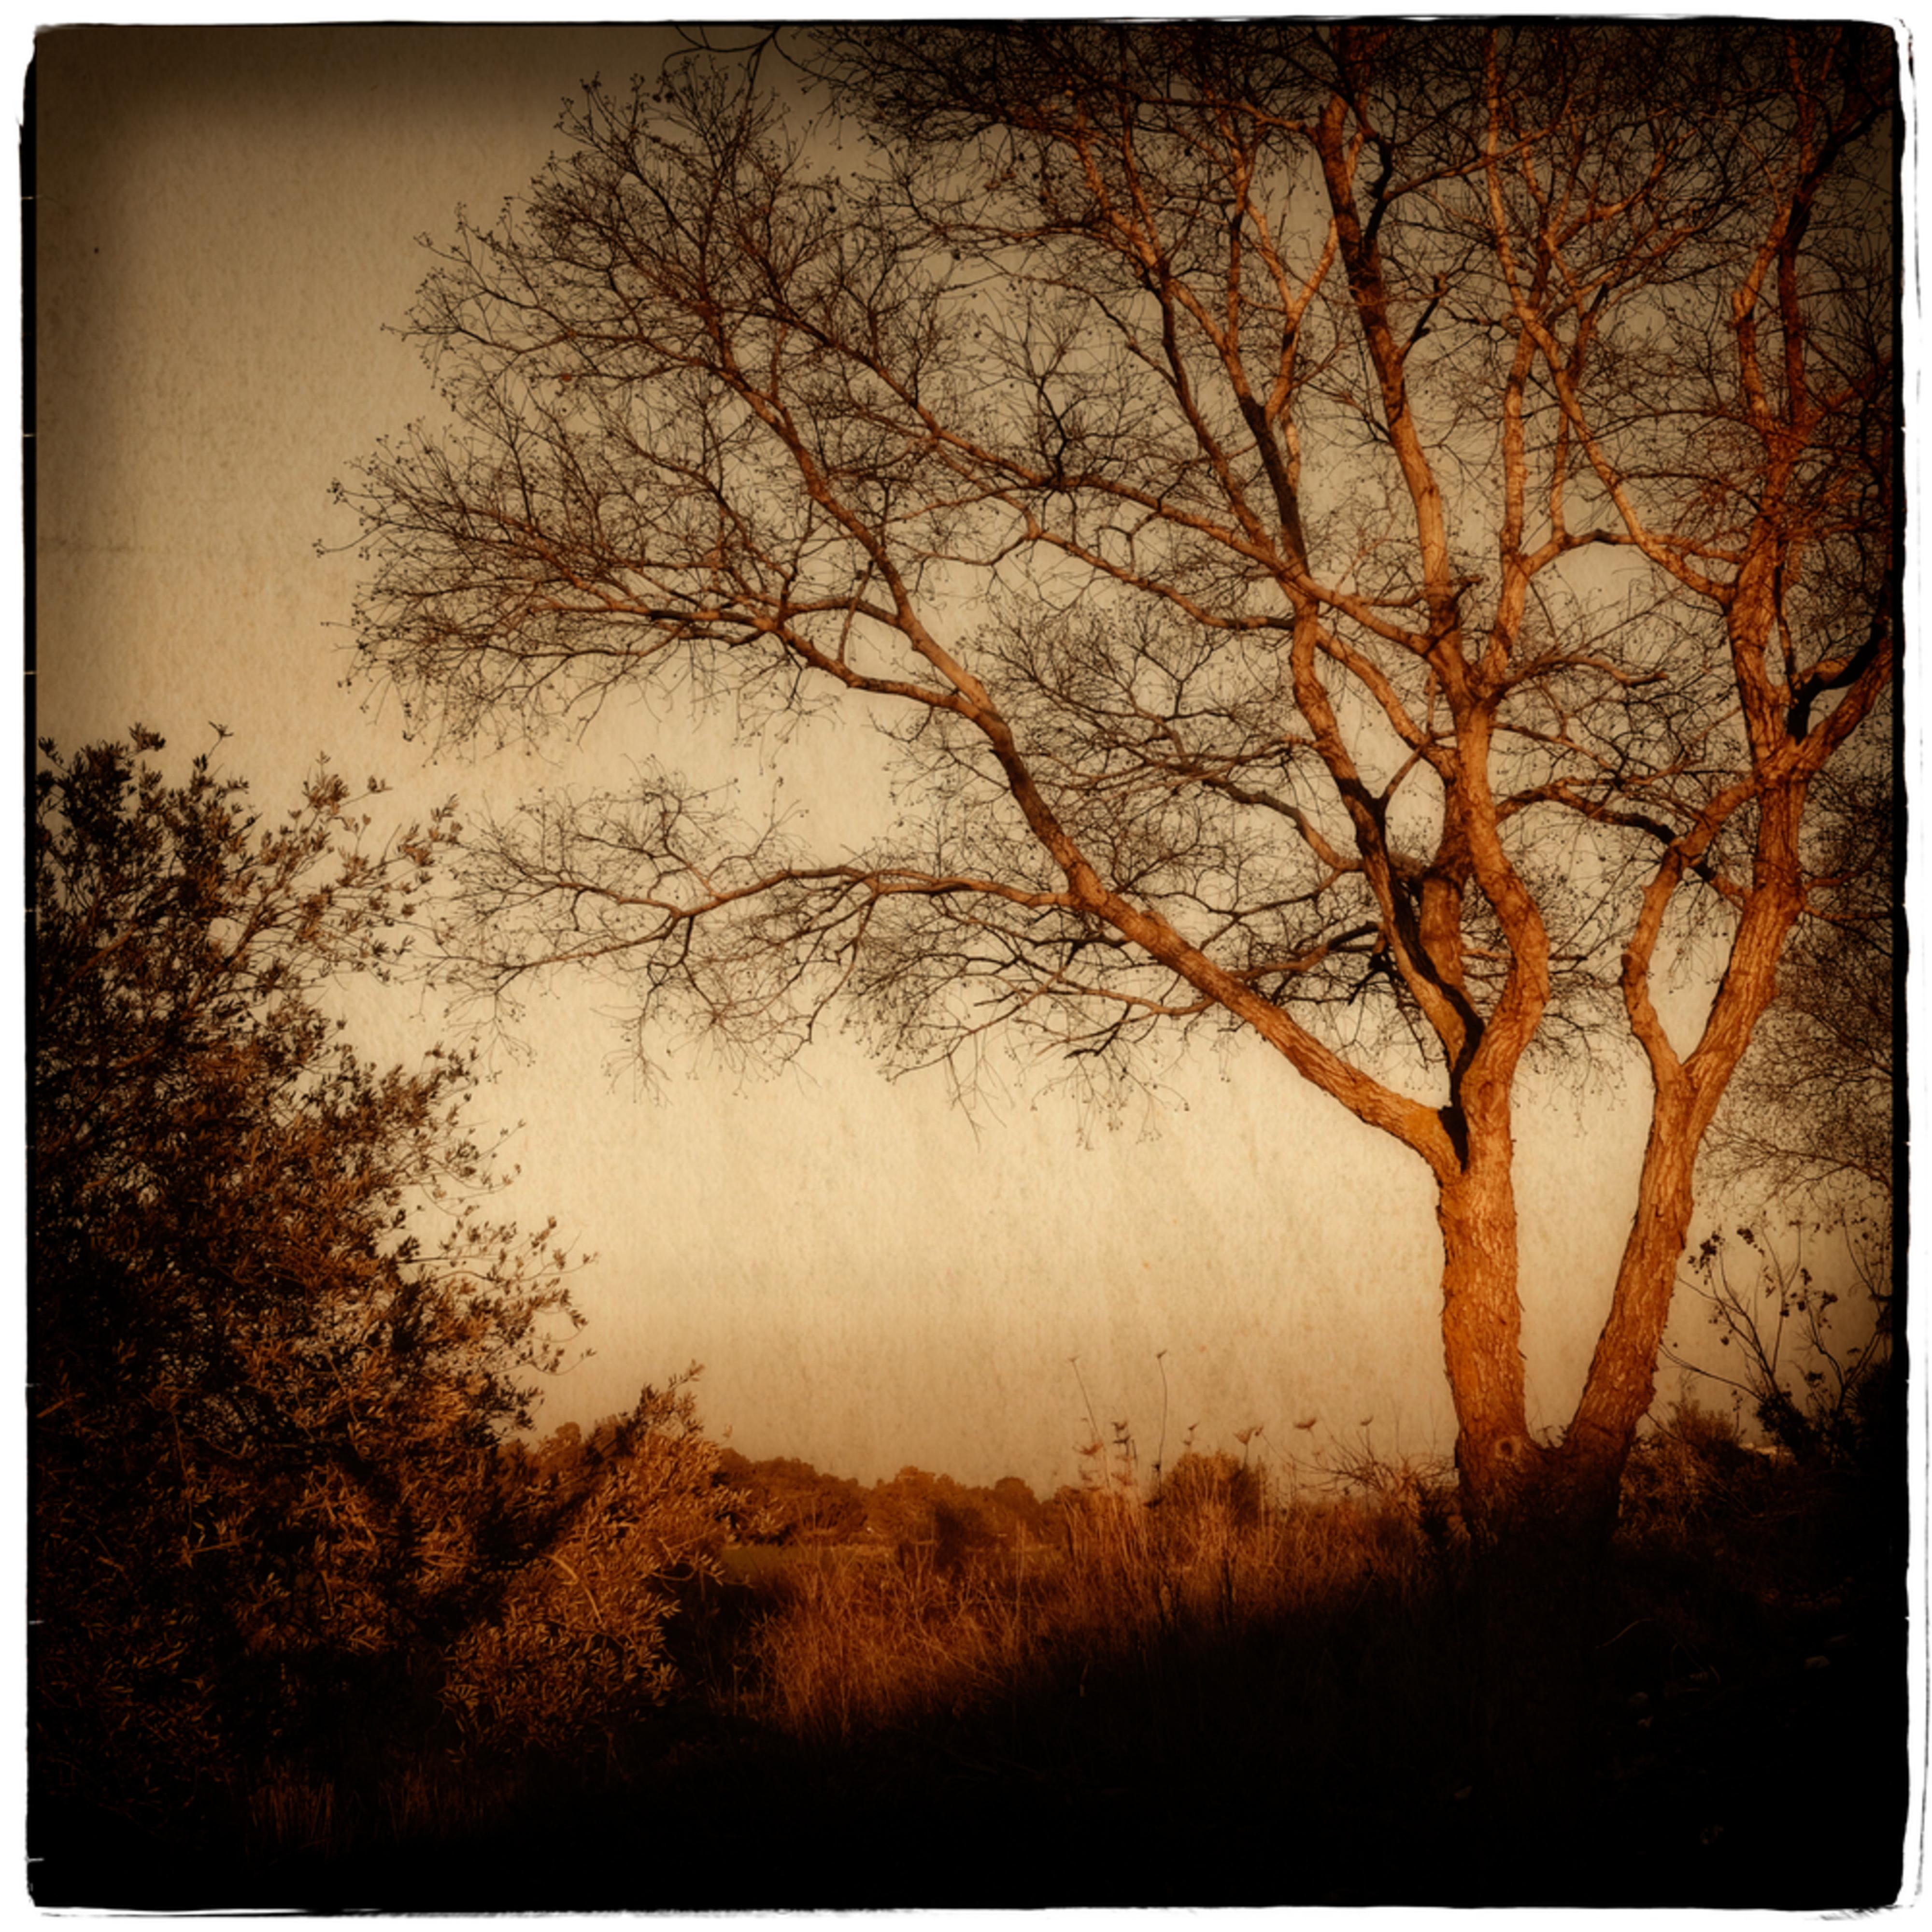 Mulberry yellow sunset 2 huhrt1